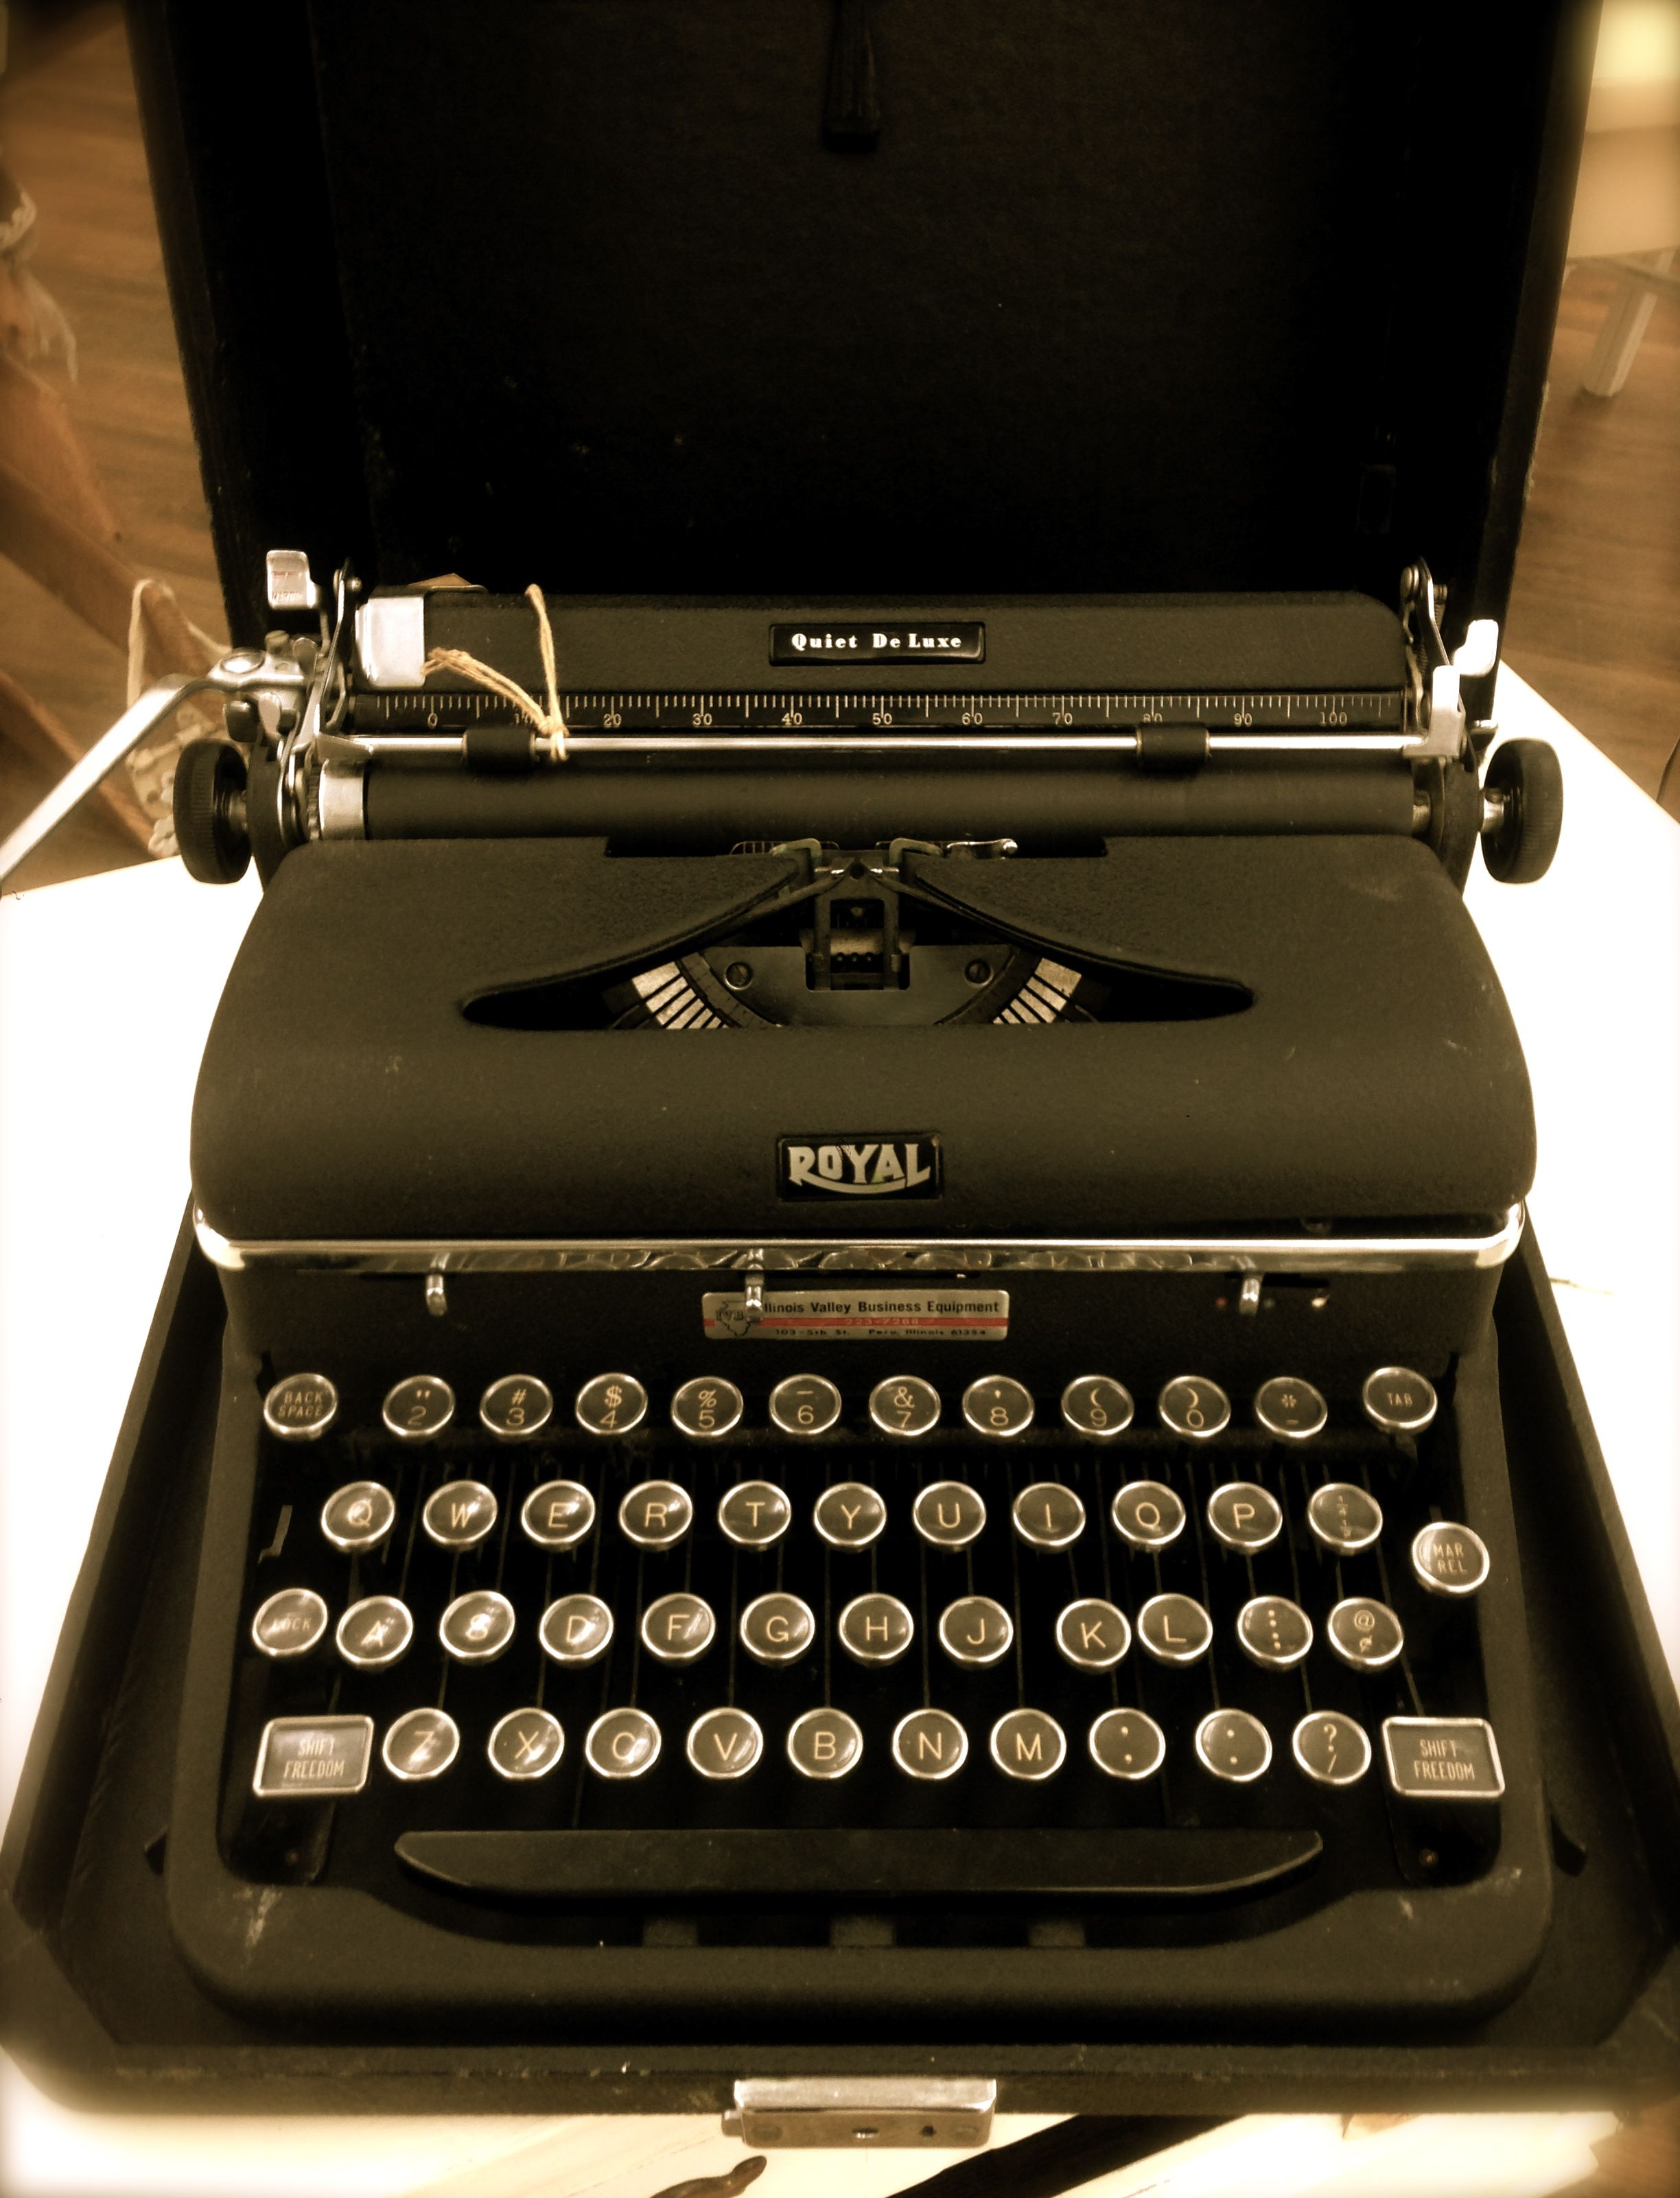 Vintage Royal Quiet Deluxe Typewriter Typewriter Vintage Typewriters Royal Typewriter